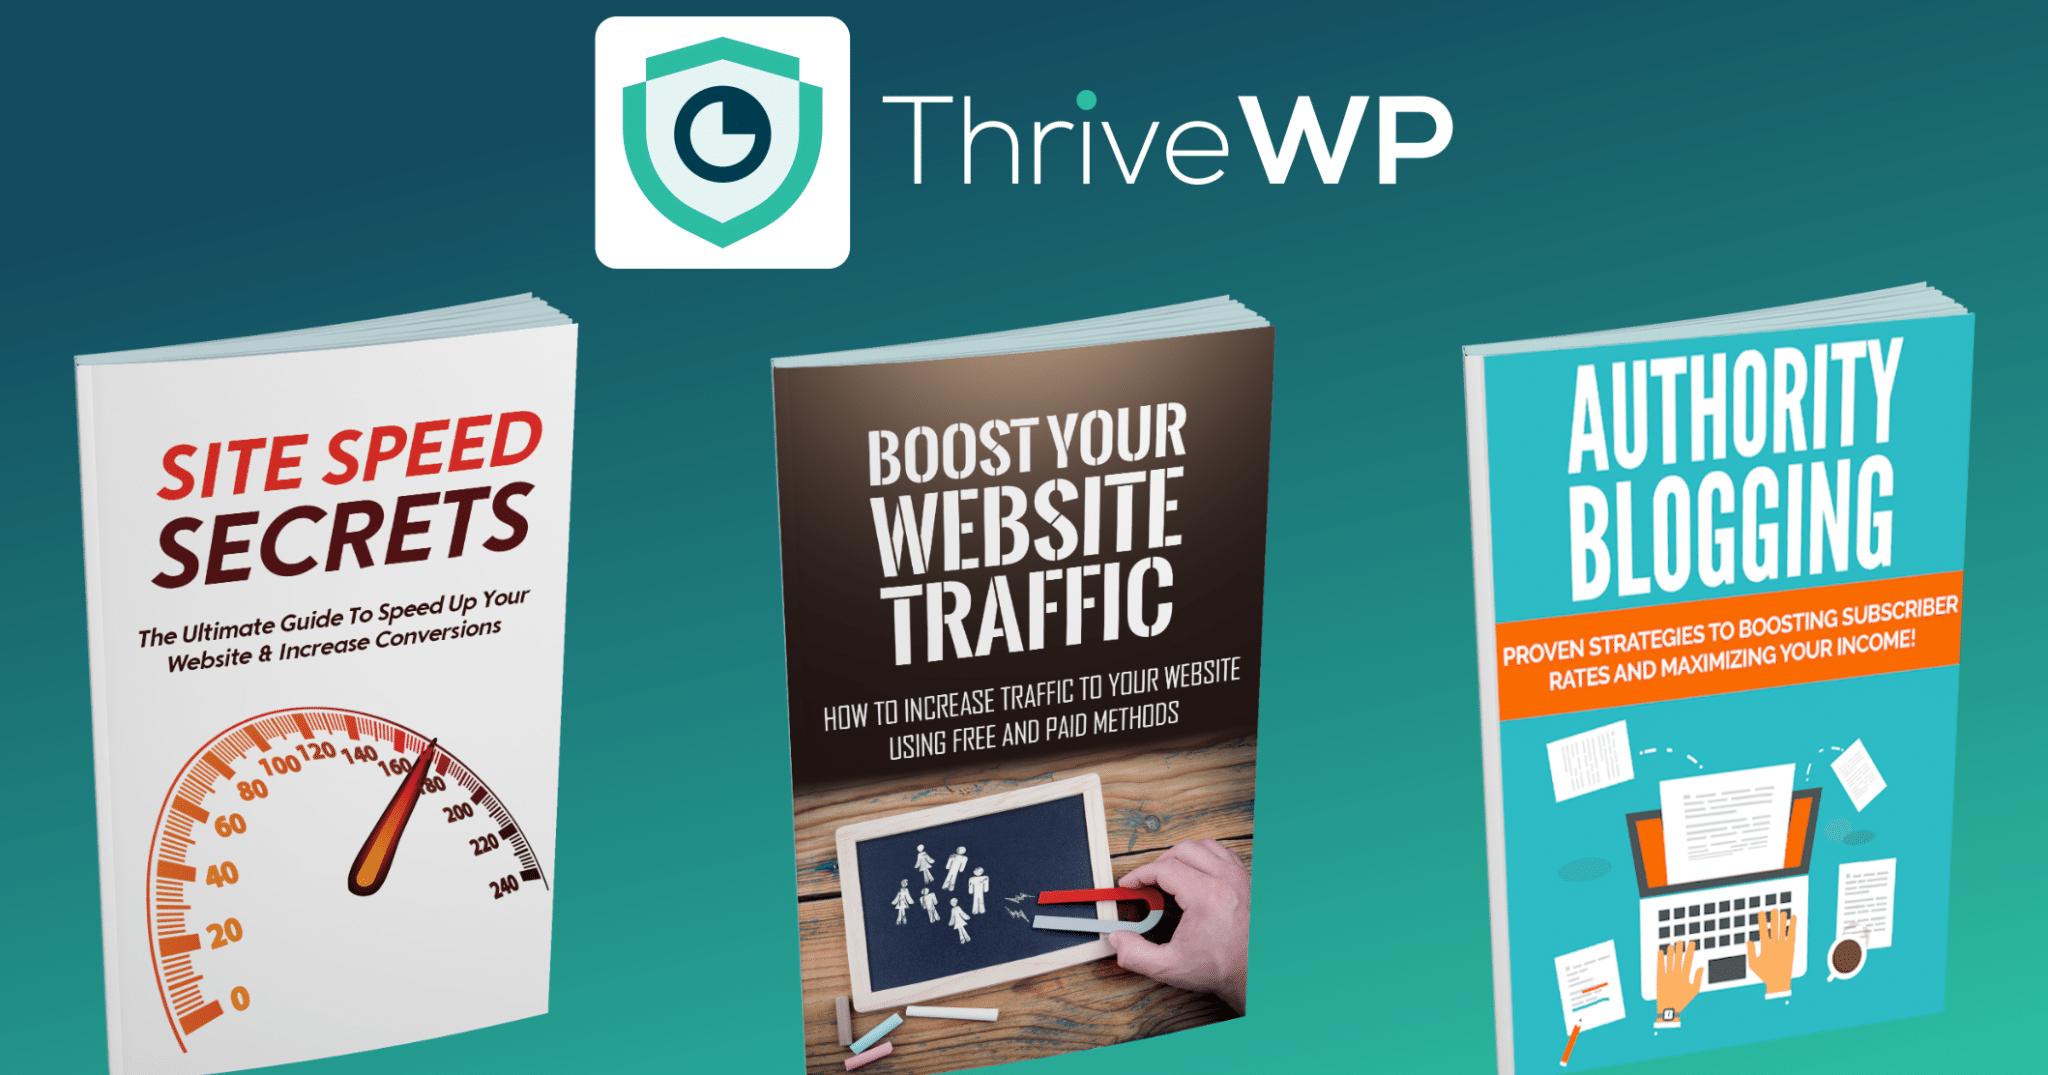 White Label WordPress Maintenance Services UK ThriveWP eBook